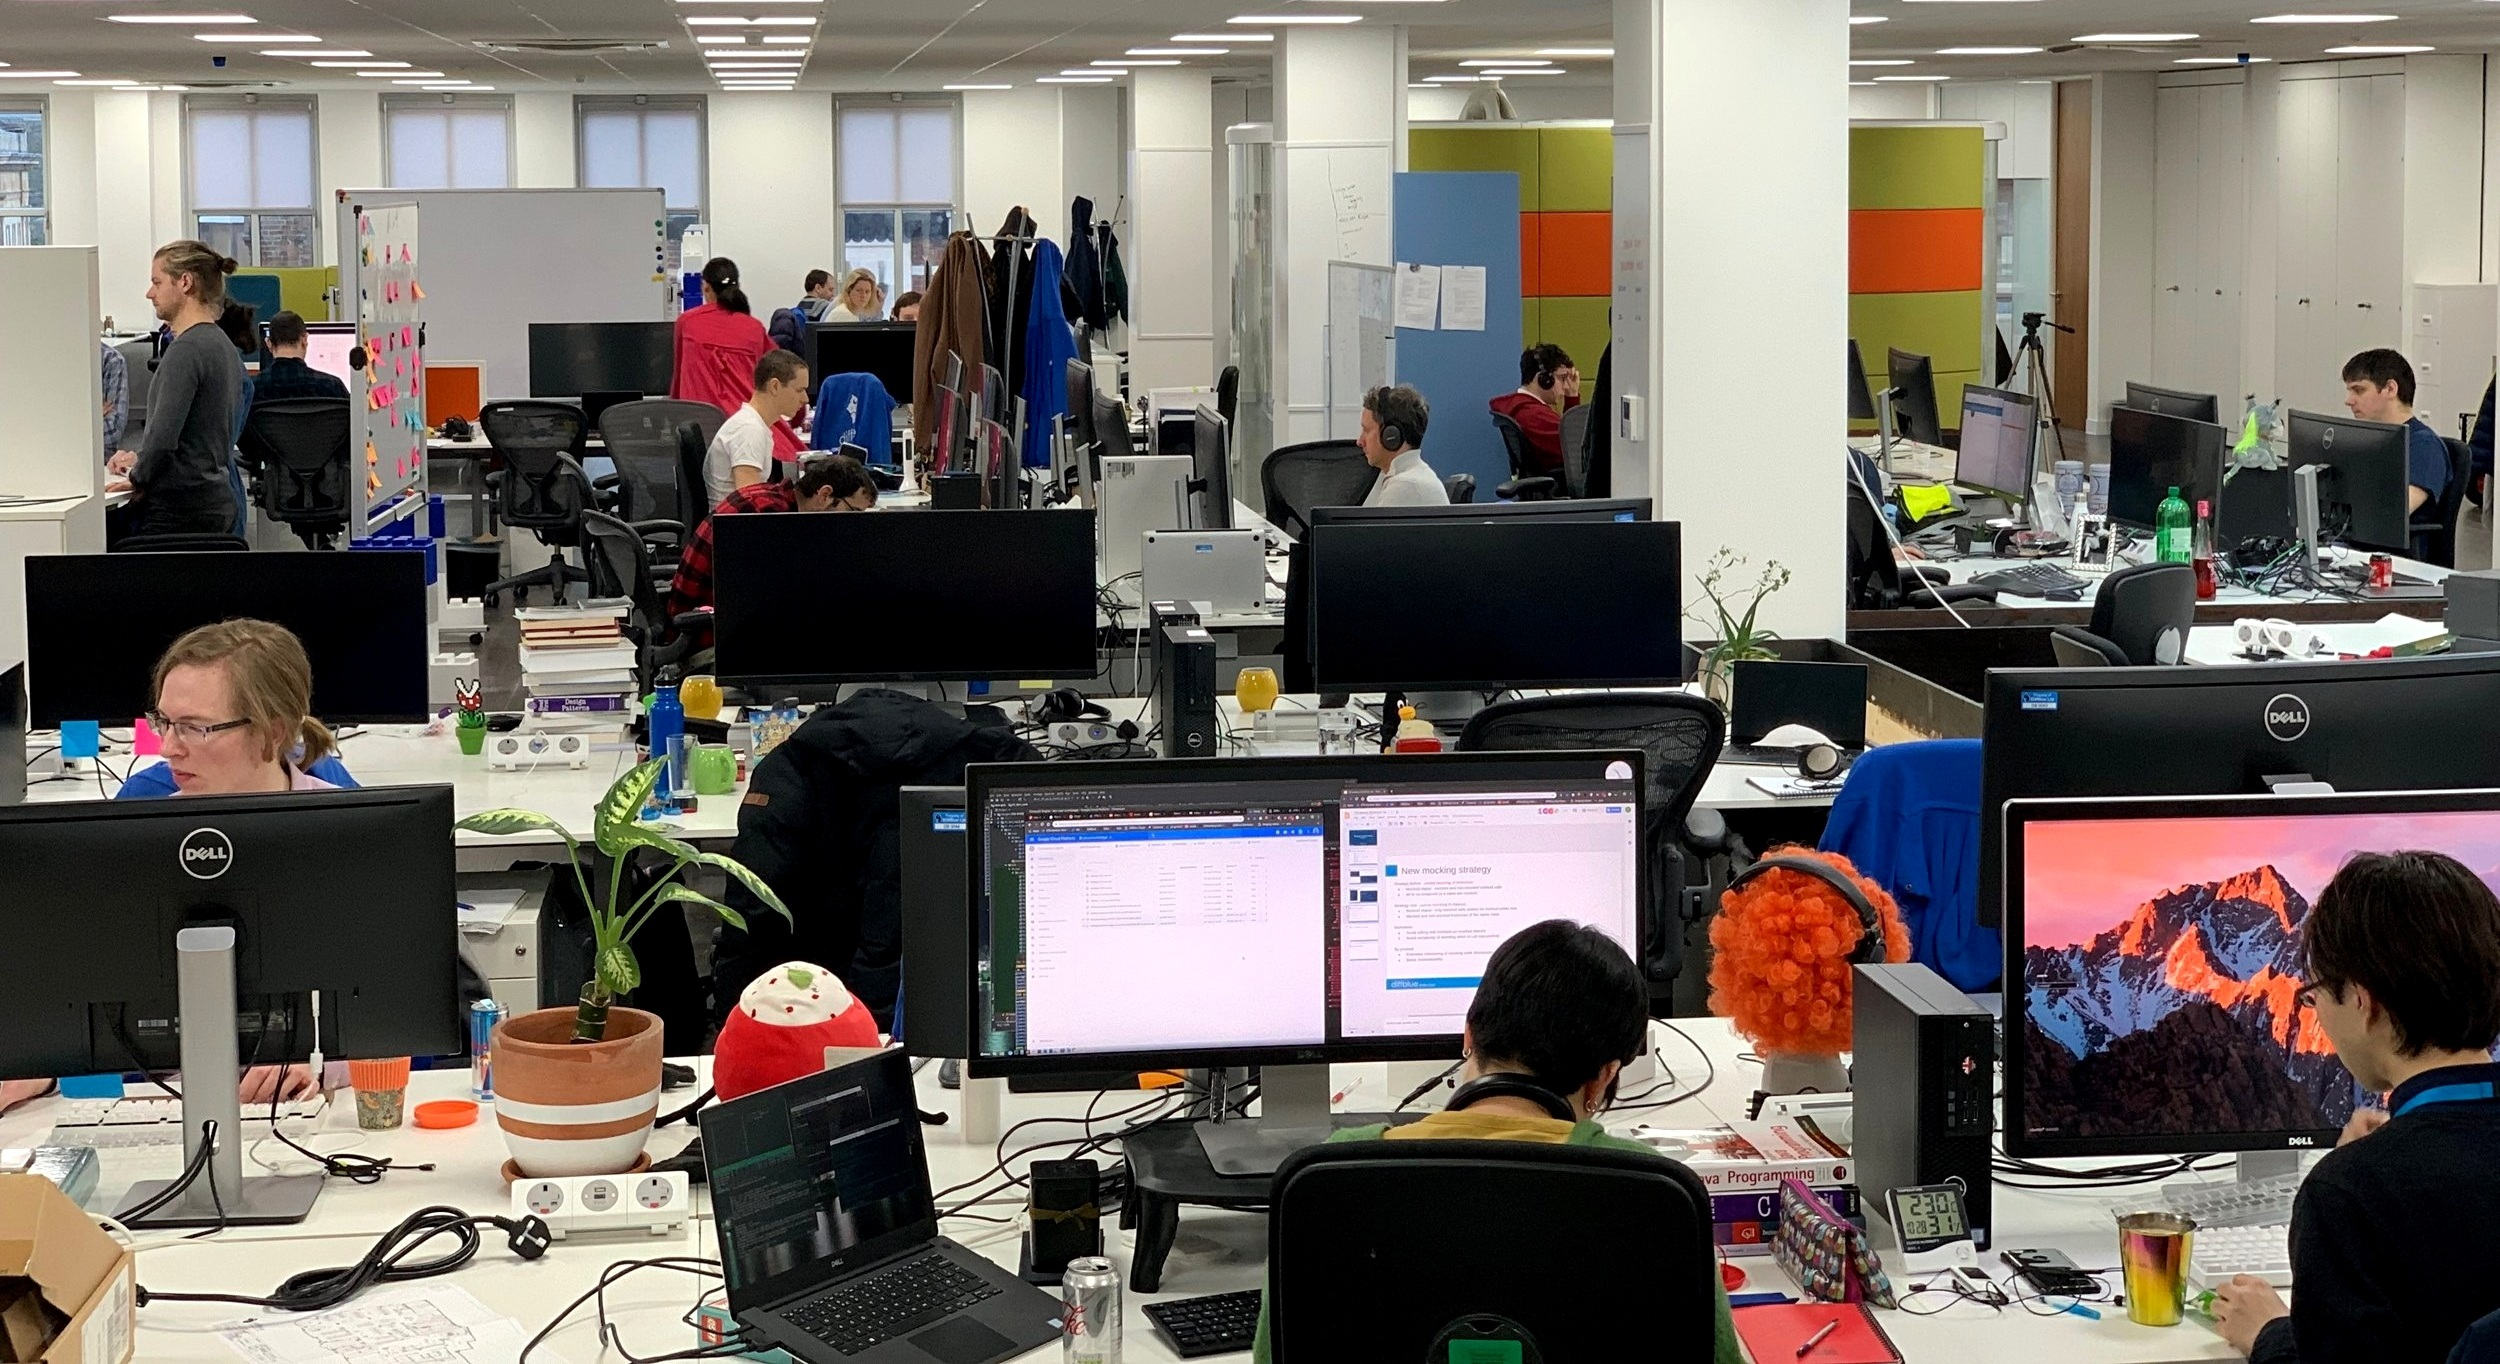 officeexpansion